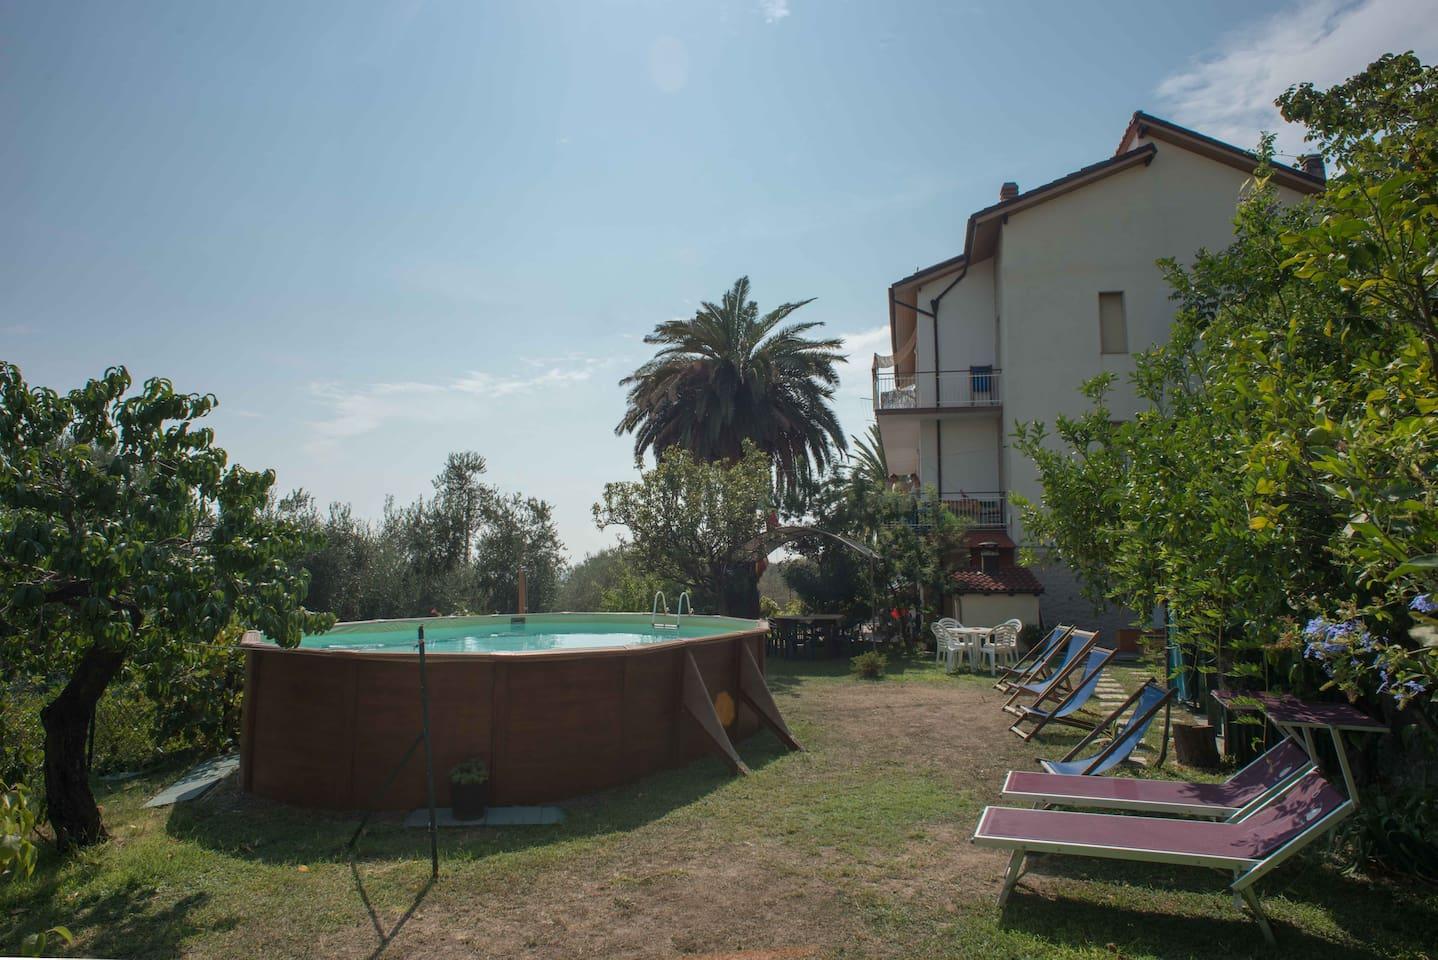 giardino attrezzato con lettini, sdraio, tavoli, sedie